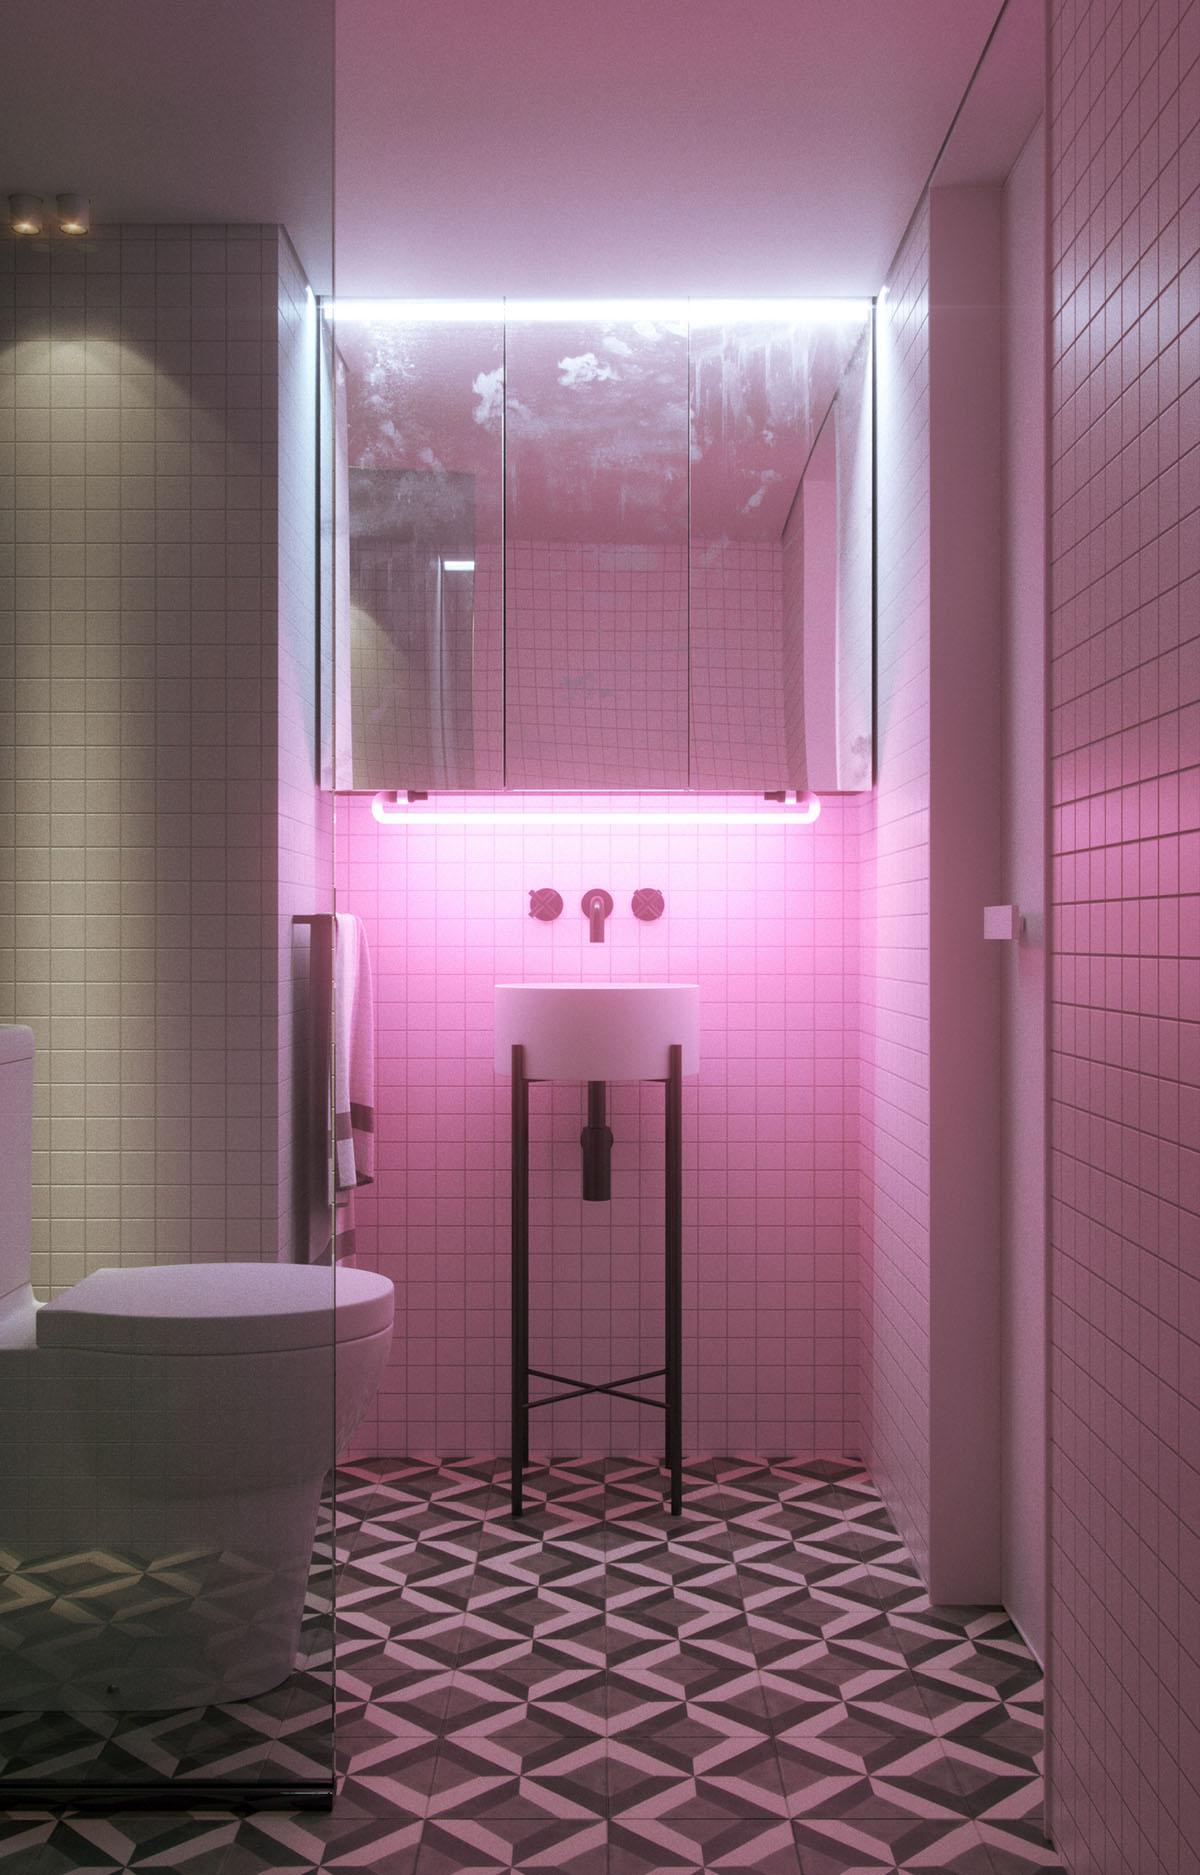 Super Compact Spaces: A Minimalist Studio Apartment Under